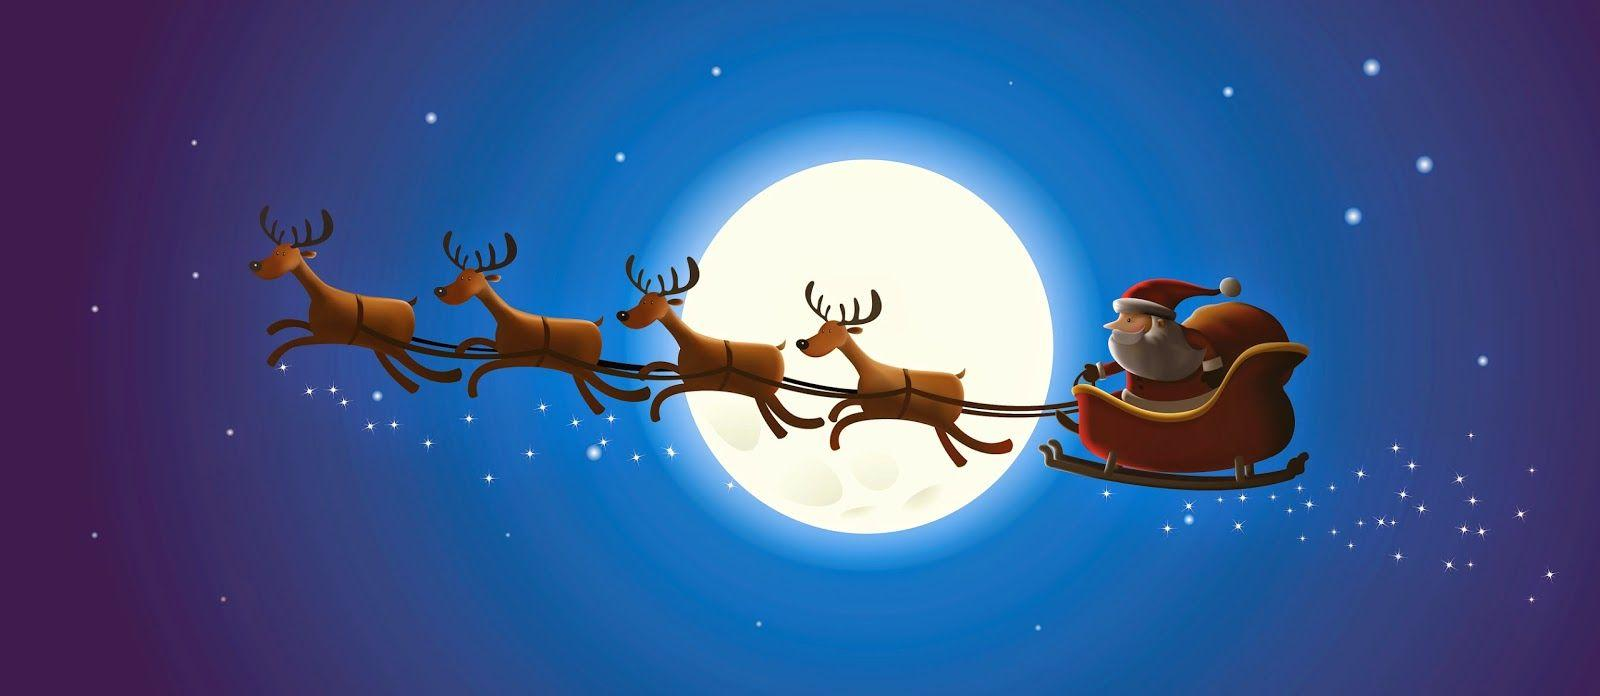 Санта клаус на оленях открытка